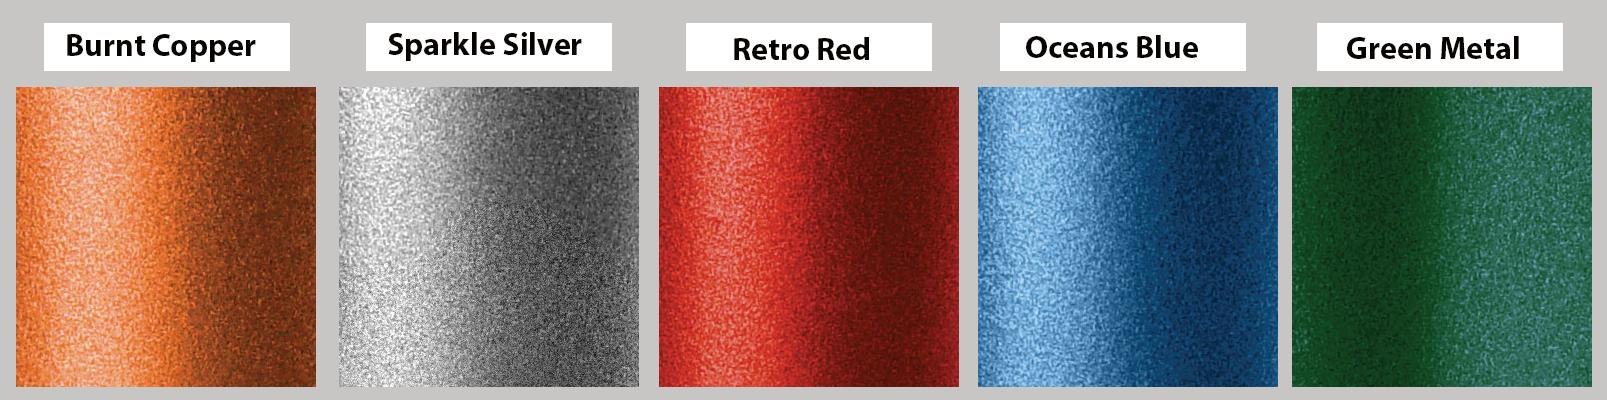 dupli color metal specks spray paint caswell. Black Bedroom Furniture Sets. Home Design Ideas